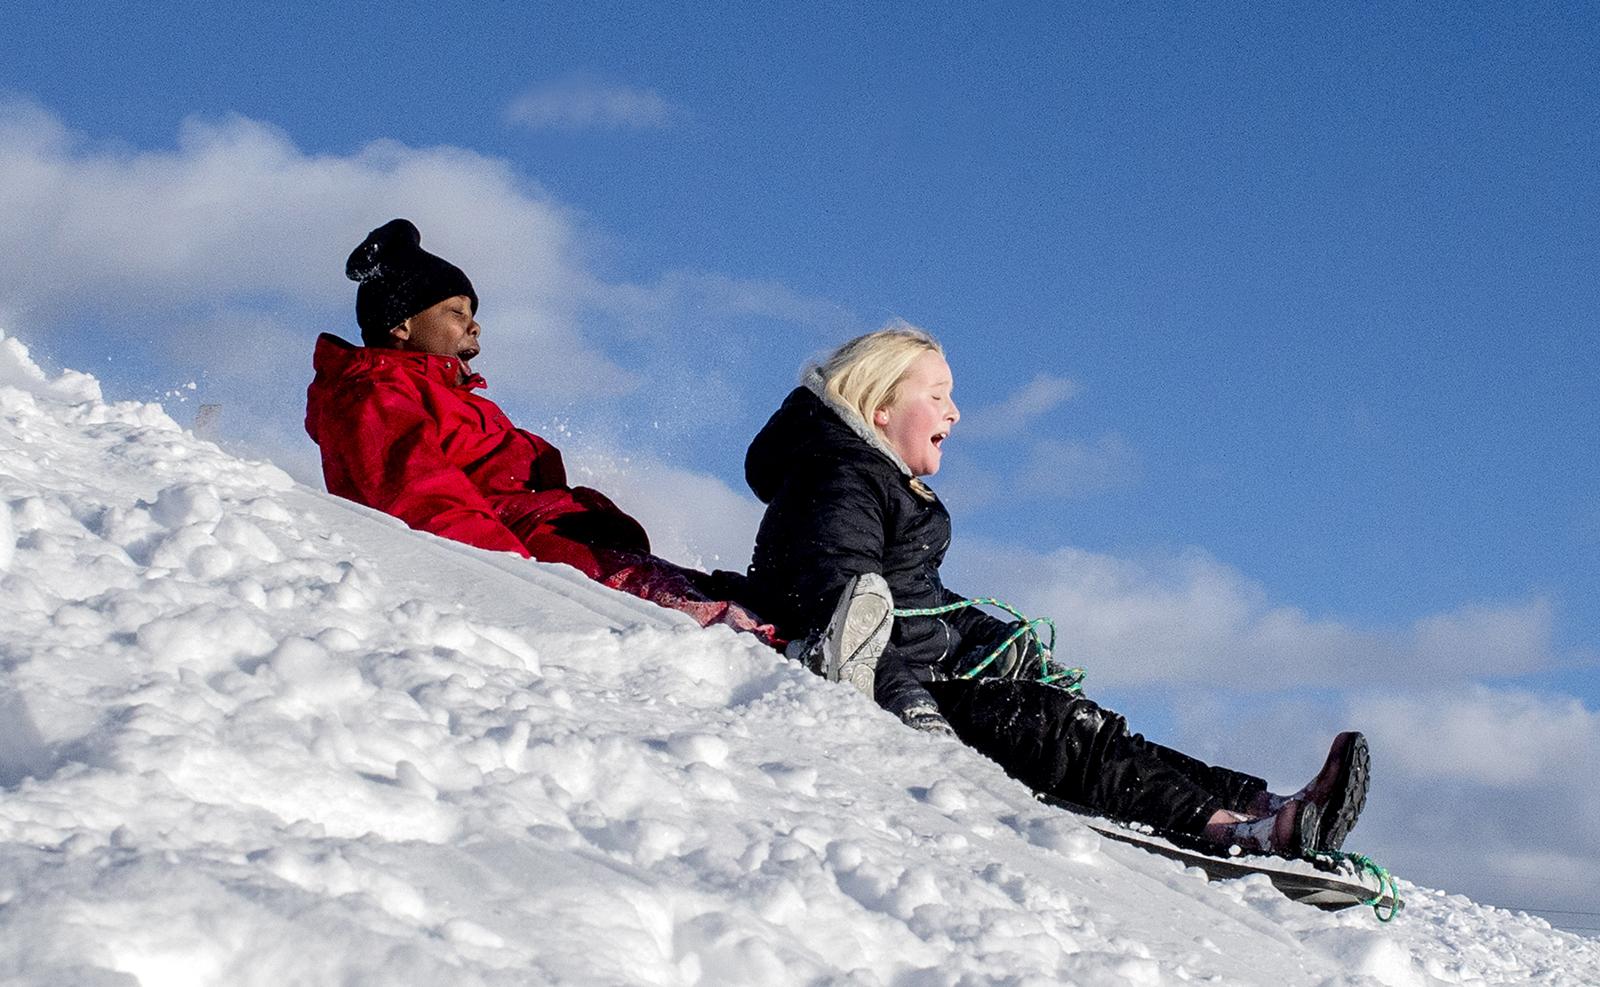 Matt Gerber Jr., 9, left, of Flint, Mich., and Addisen Athey, 11 of Swartz Creek, Mich., sled downhill Tuesday, Feb. 16, 2021, at Southwestern Classical Academy in Flint, after an overnight snowfall. AP